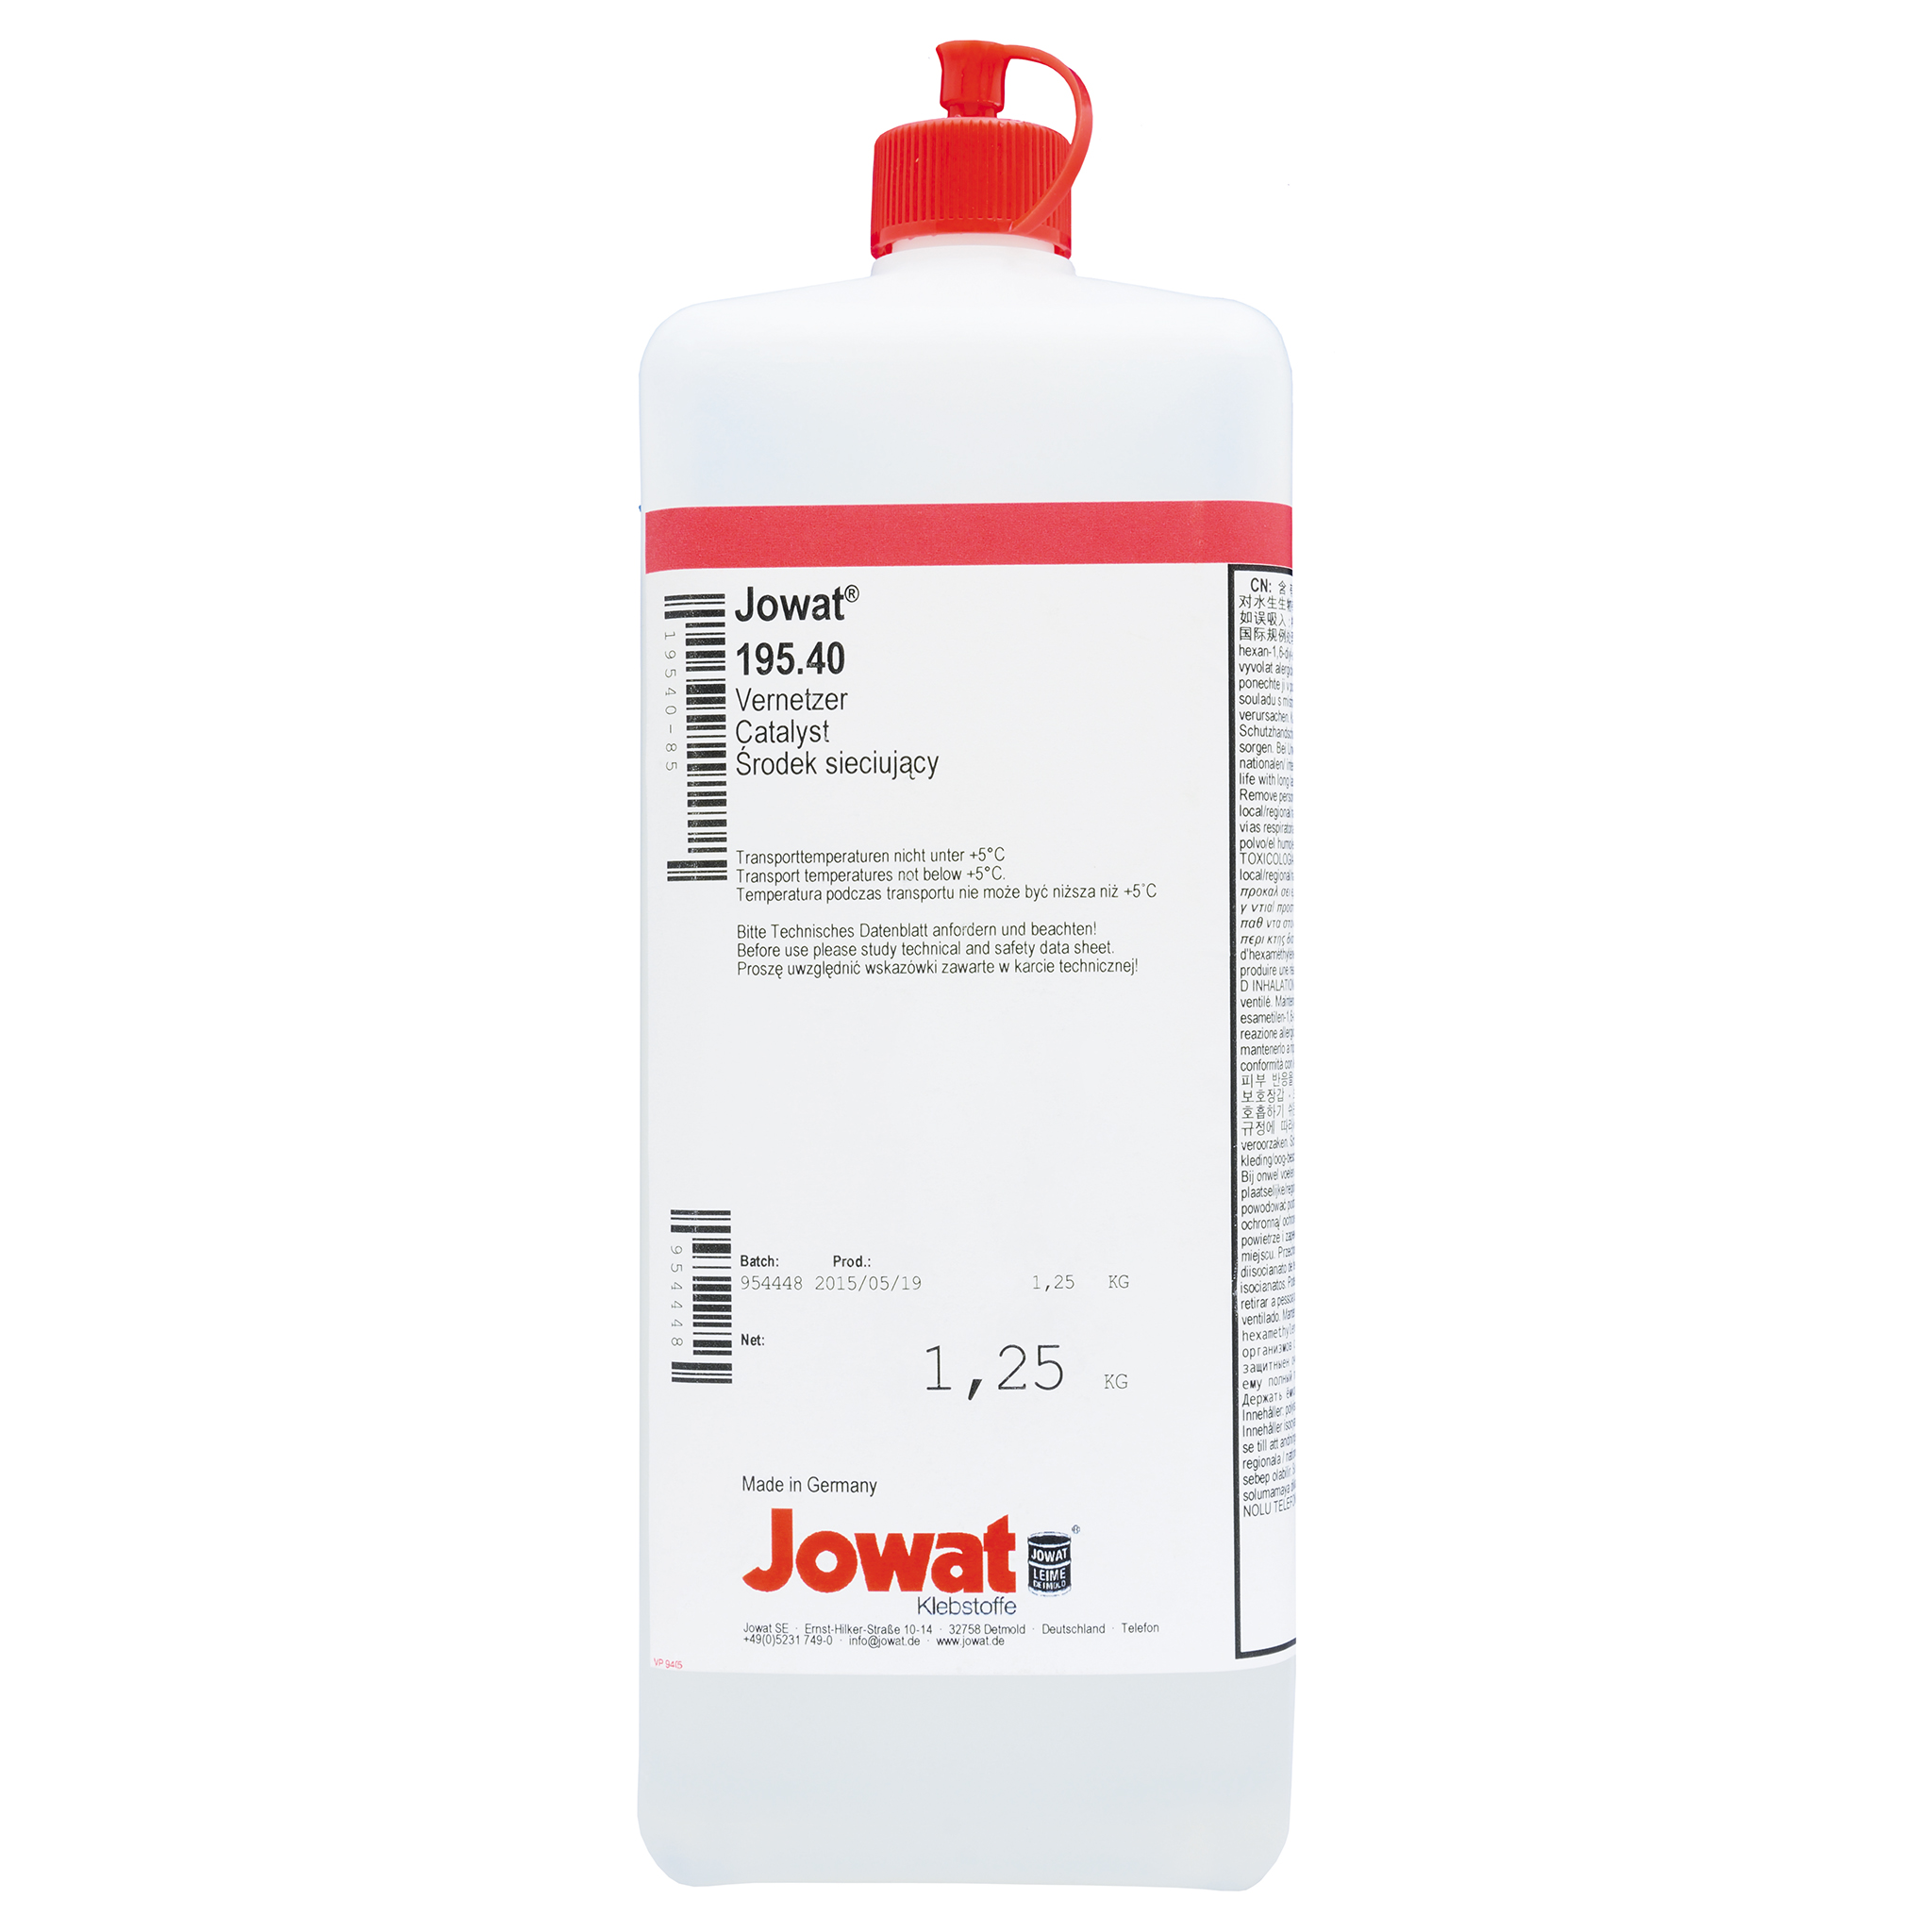 JOWAT 195.40 - hardener